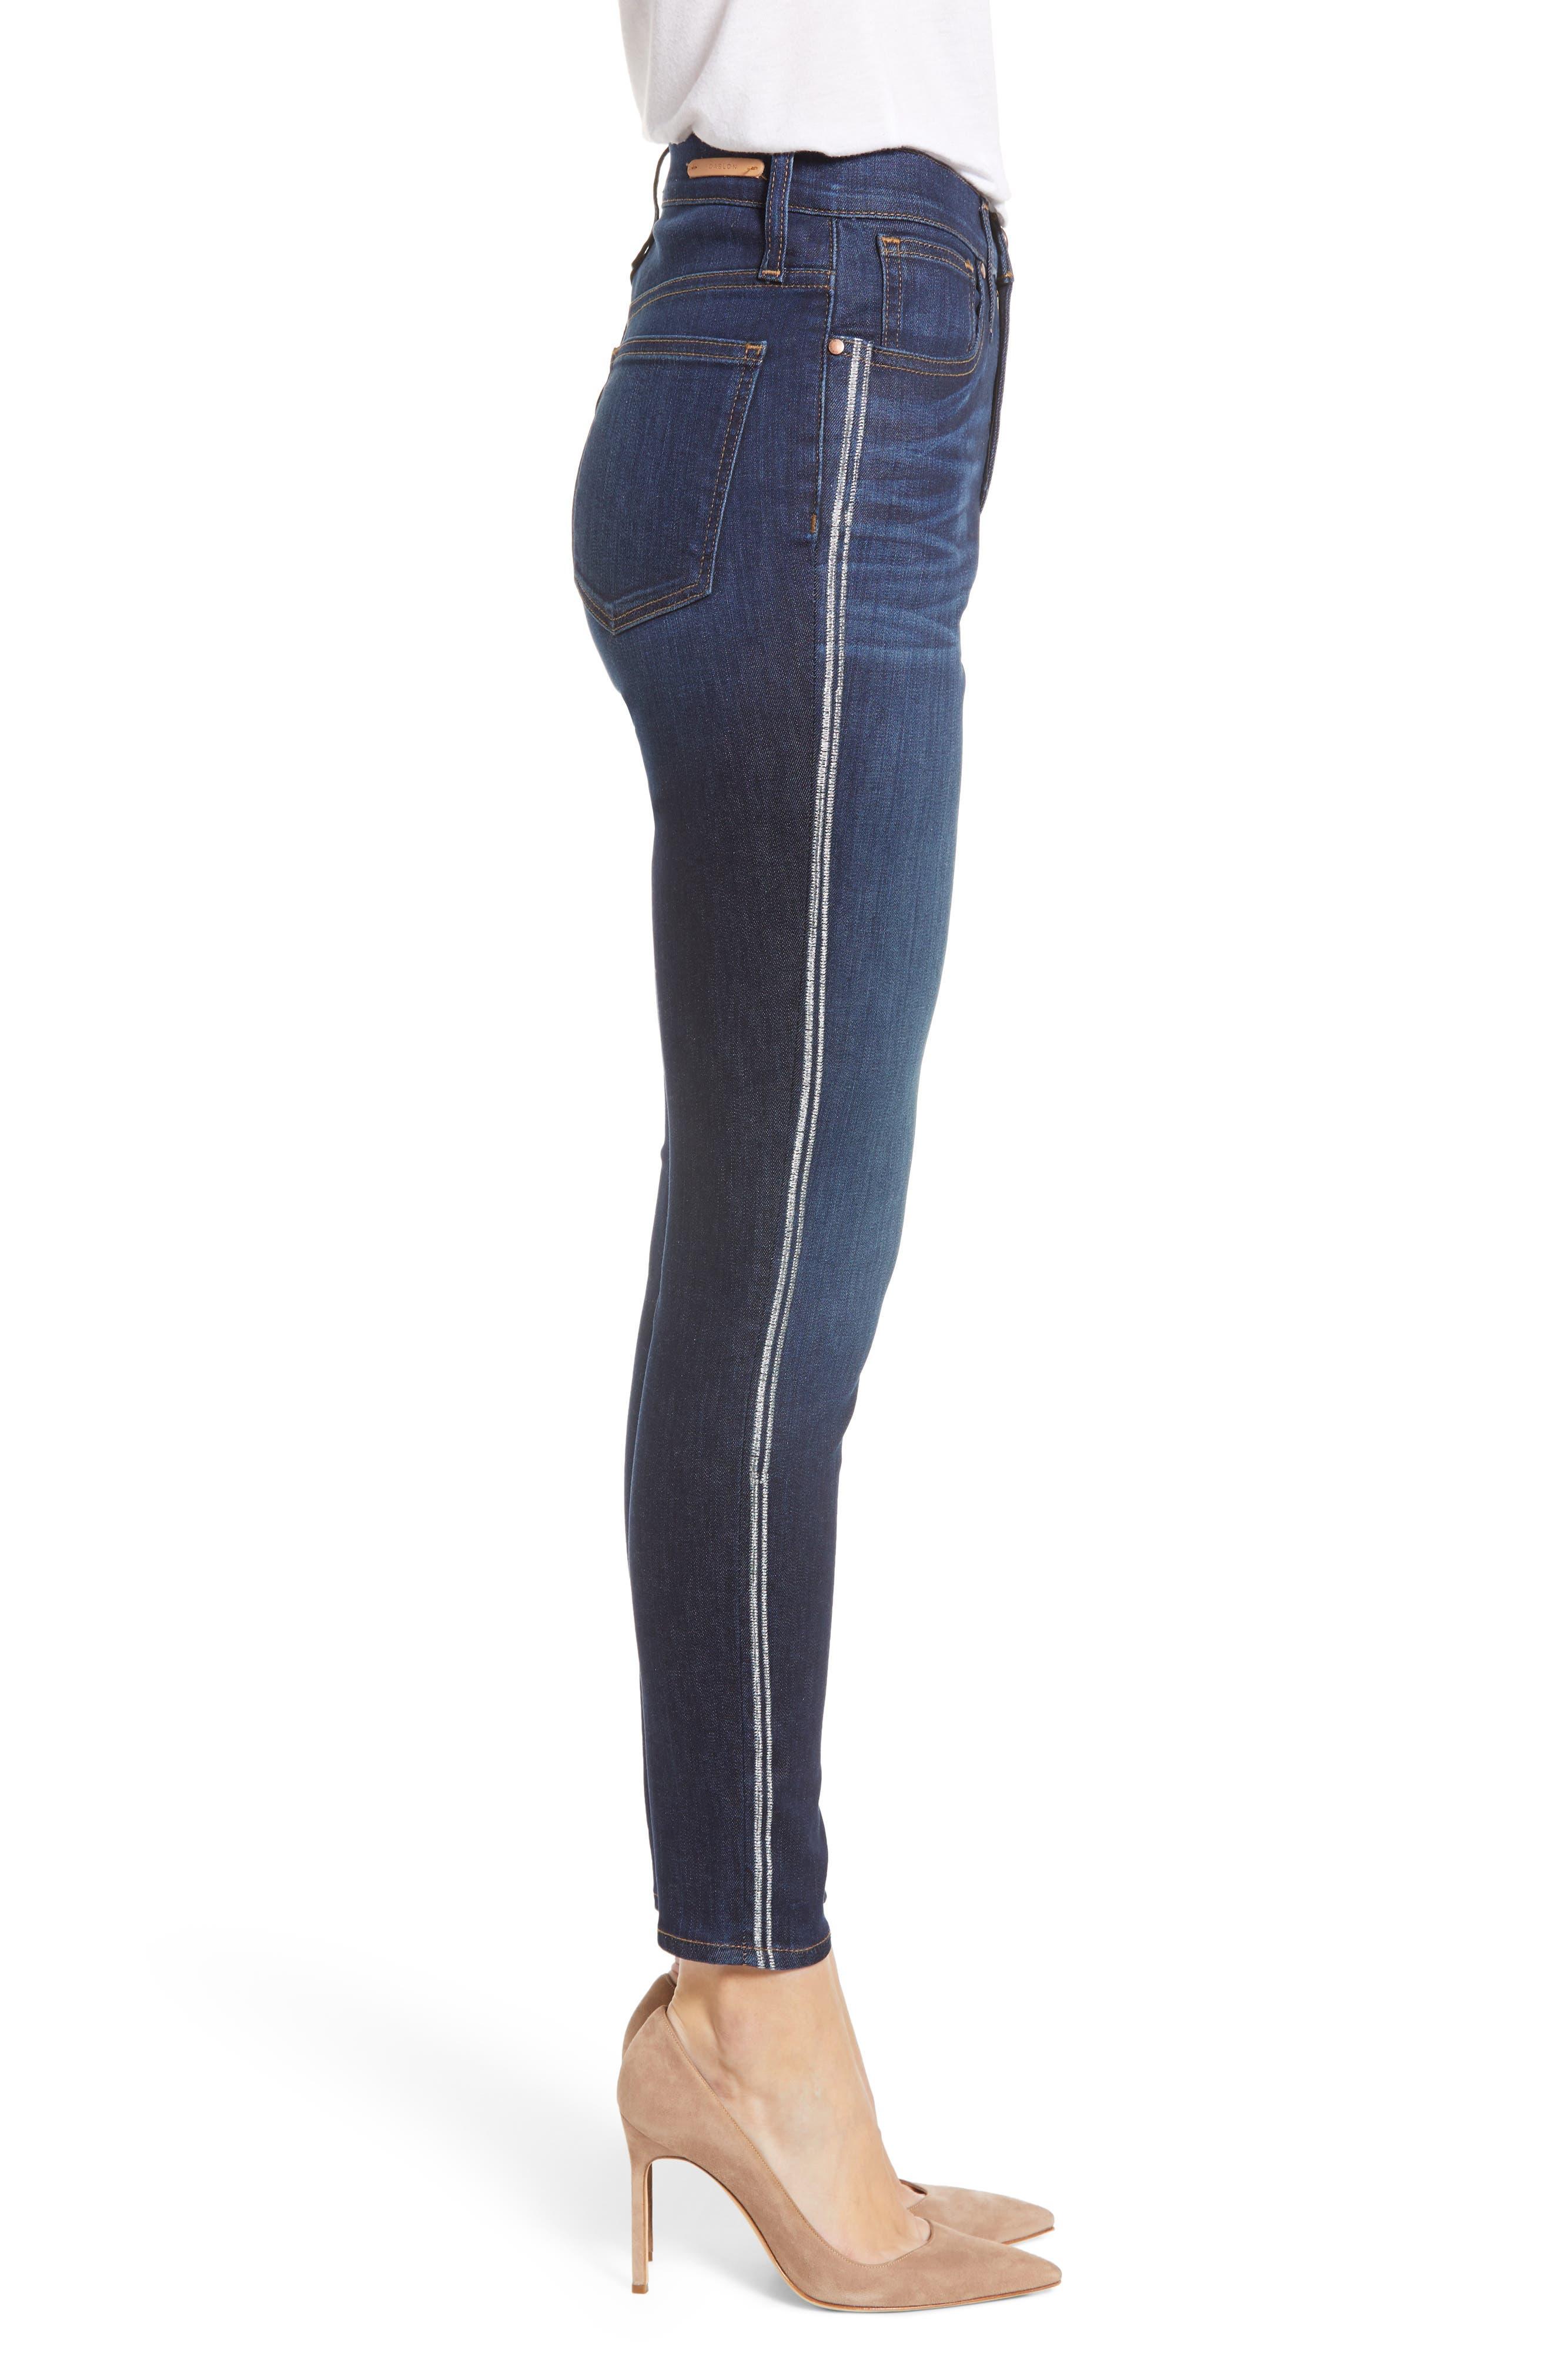 Sierra High Waist Ankle Skinny Jeans,                             Alternate thumbnail 3, color,                             FRANCIS